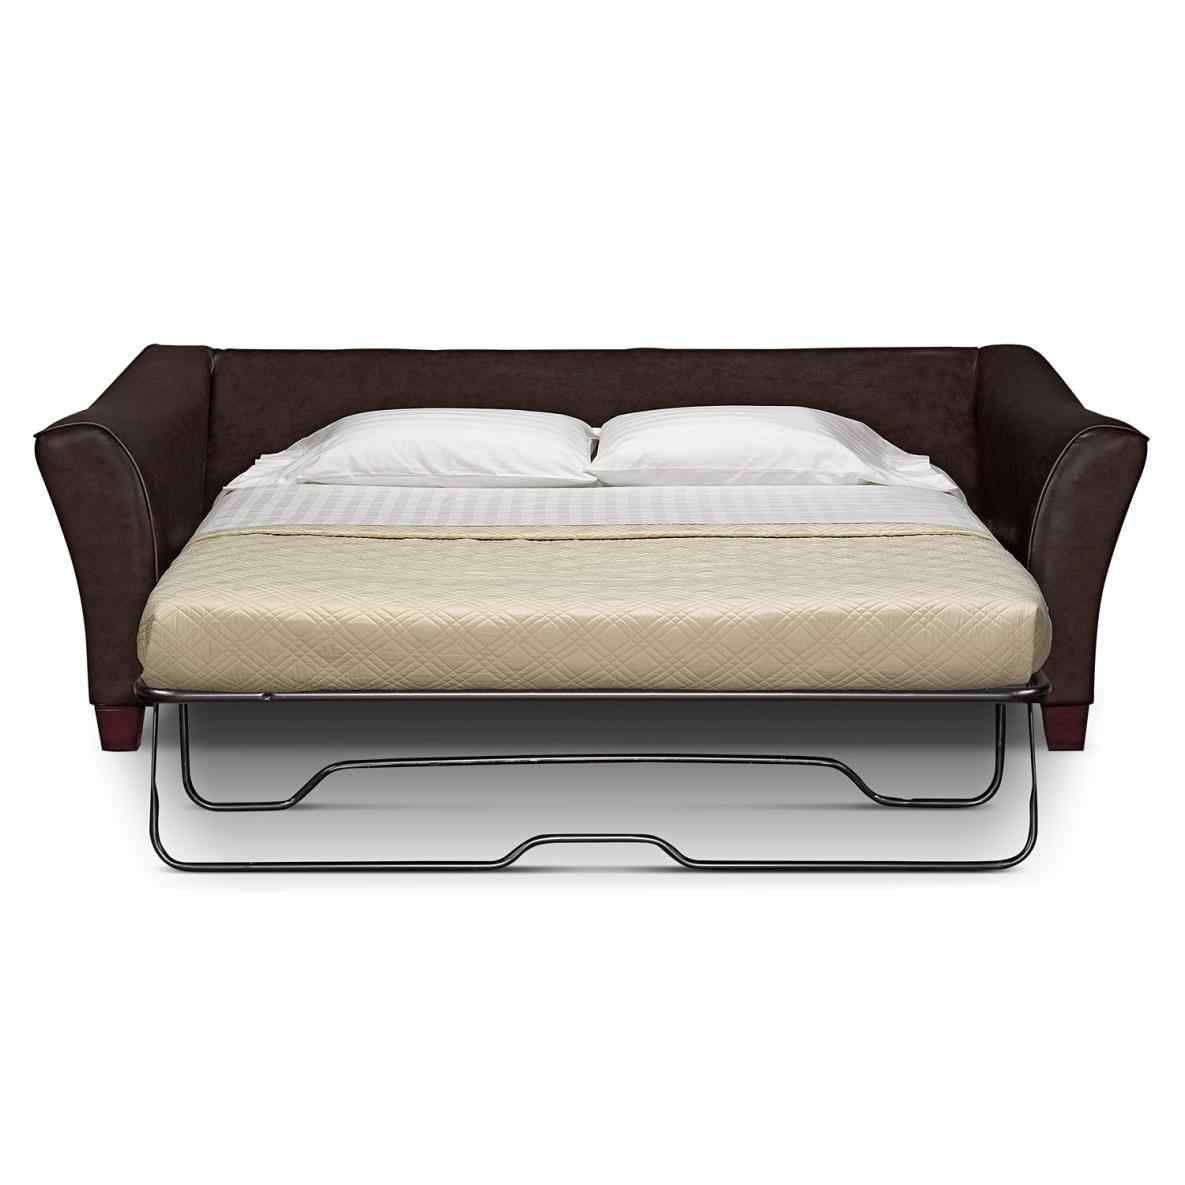 Foam Replacement Bed S Tempurpedic Sleeper Sofa Mattress American Signature  Furniture Furniture Tempurpedic Sleeper Sofa Mattress